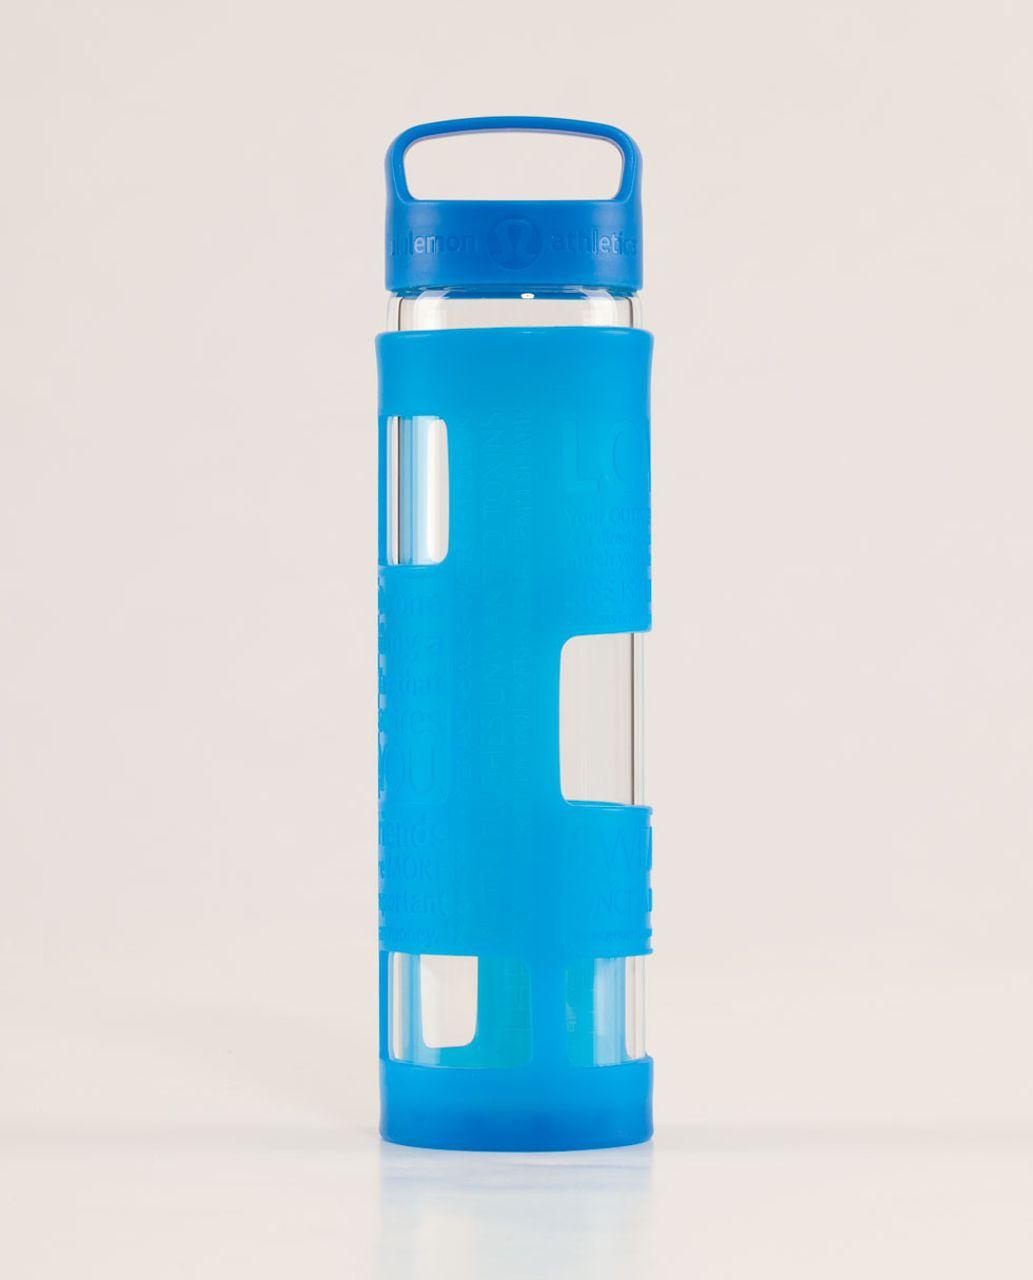 Lululemon Pure Balance Water Bottle - Beaming Blue